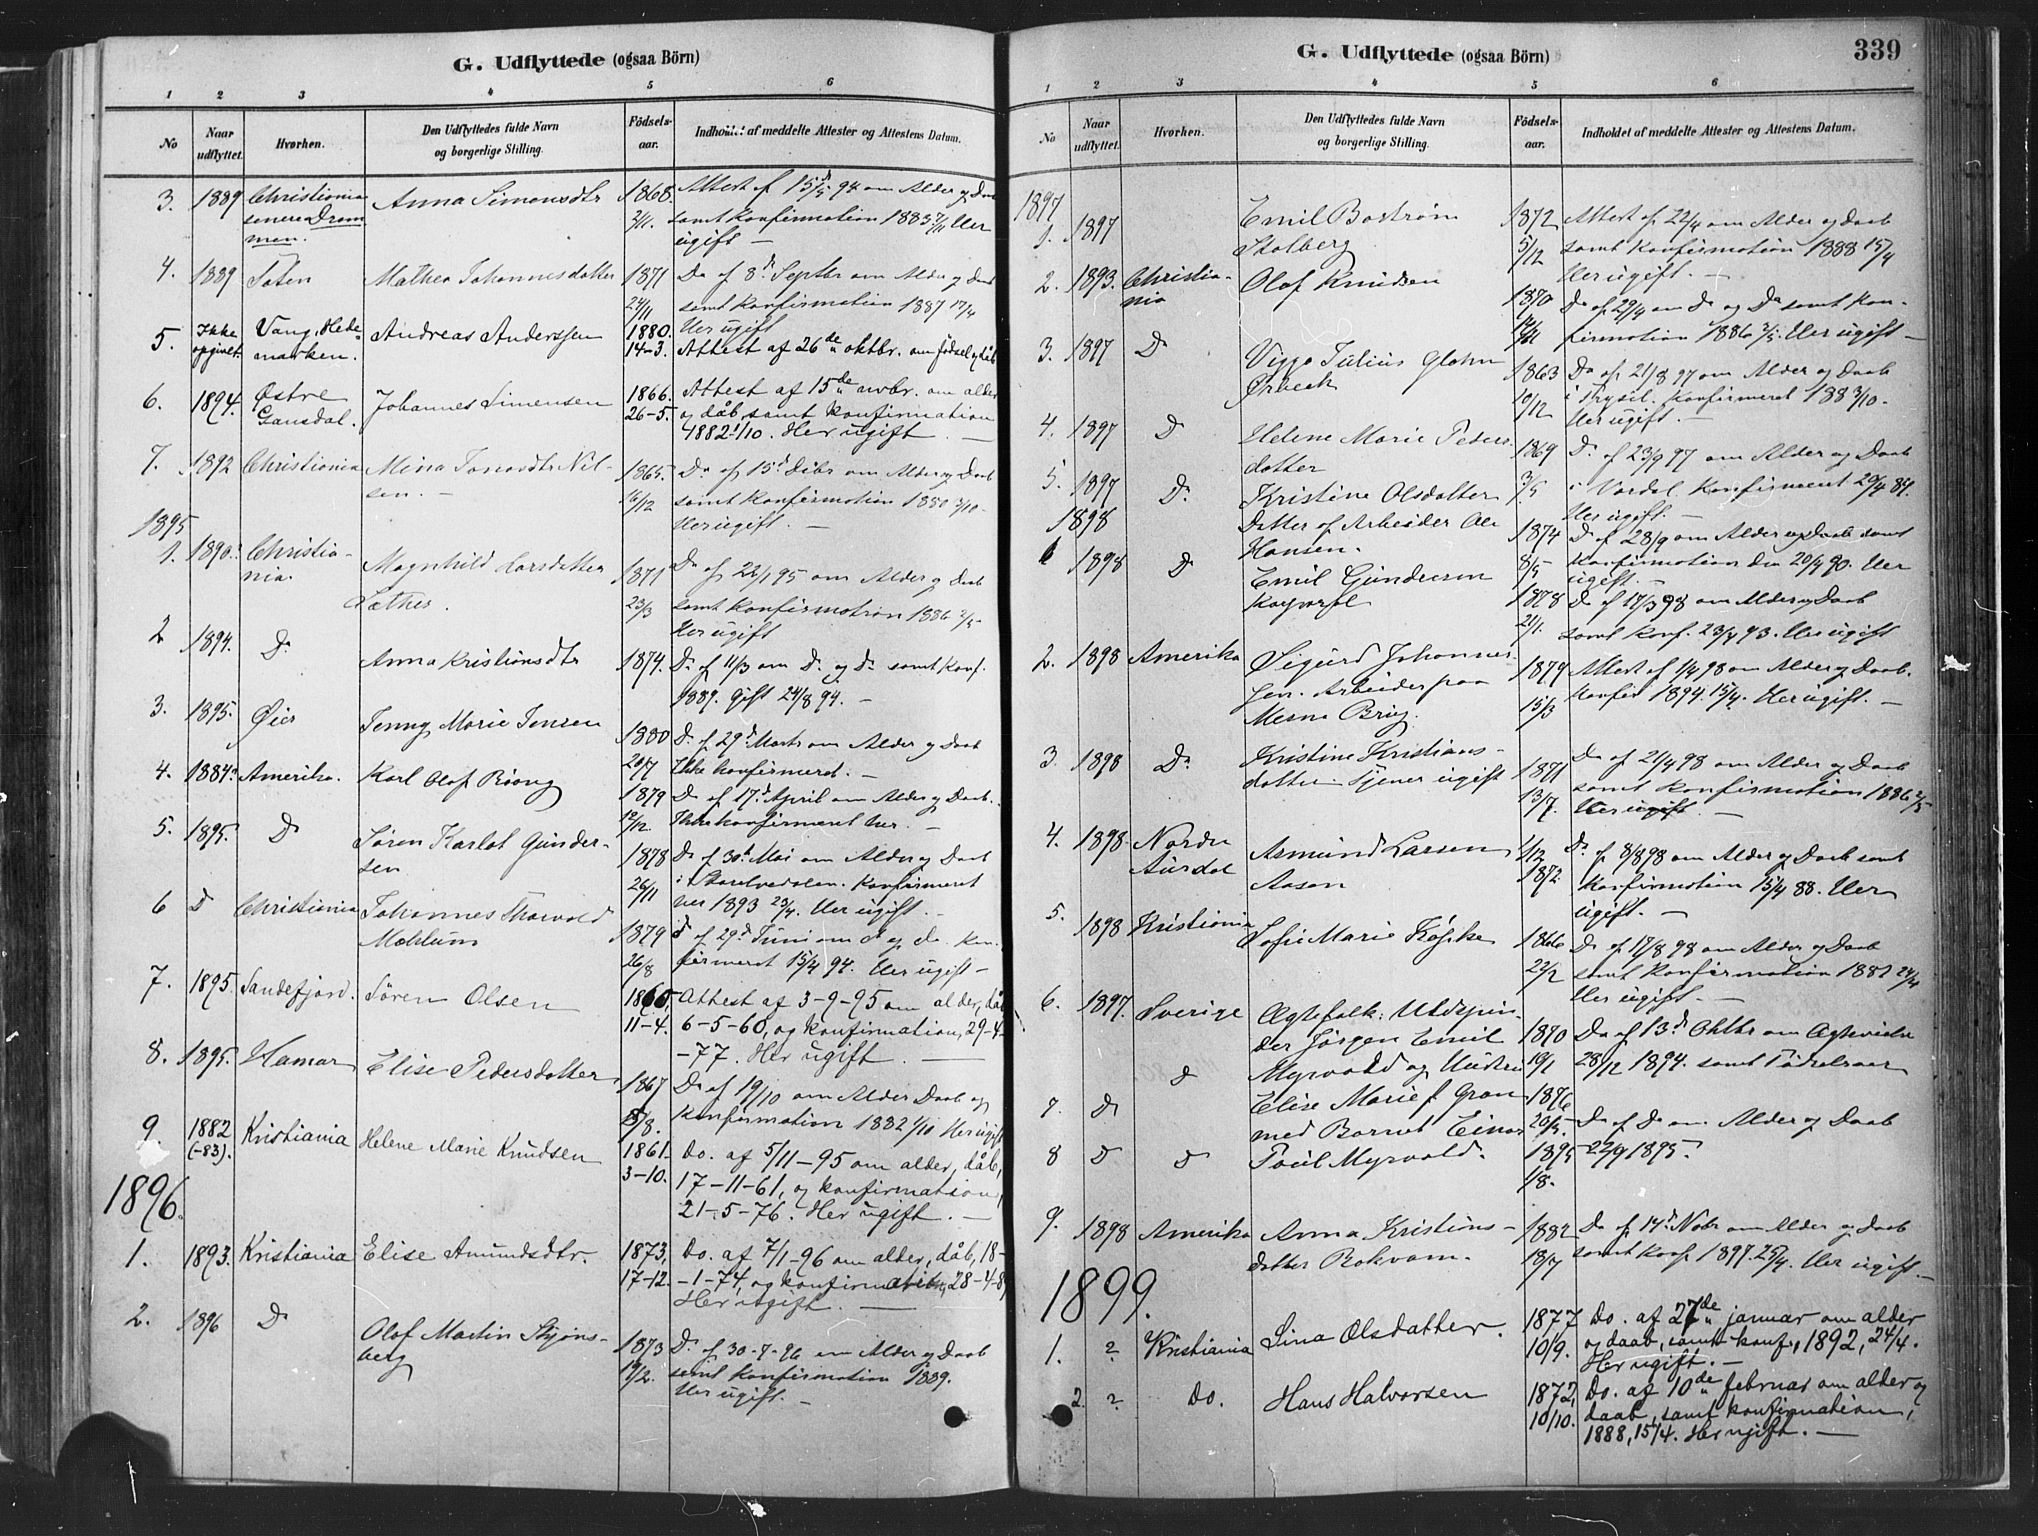 SAH, Fåberg prestekontor, H/Ha/Haa/L0010: Ministerialbok nr. 10, 1879-1900, s. 339